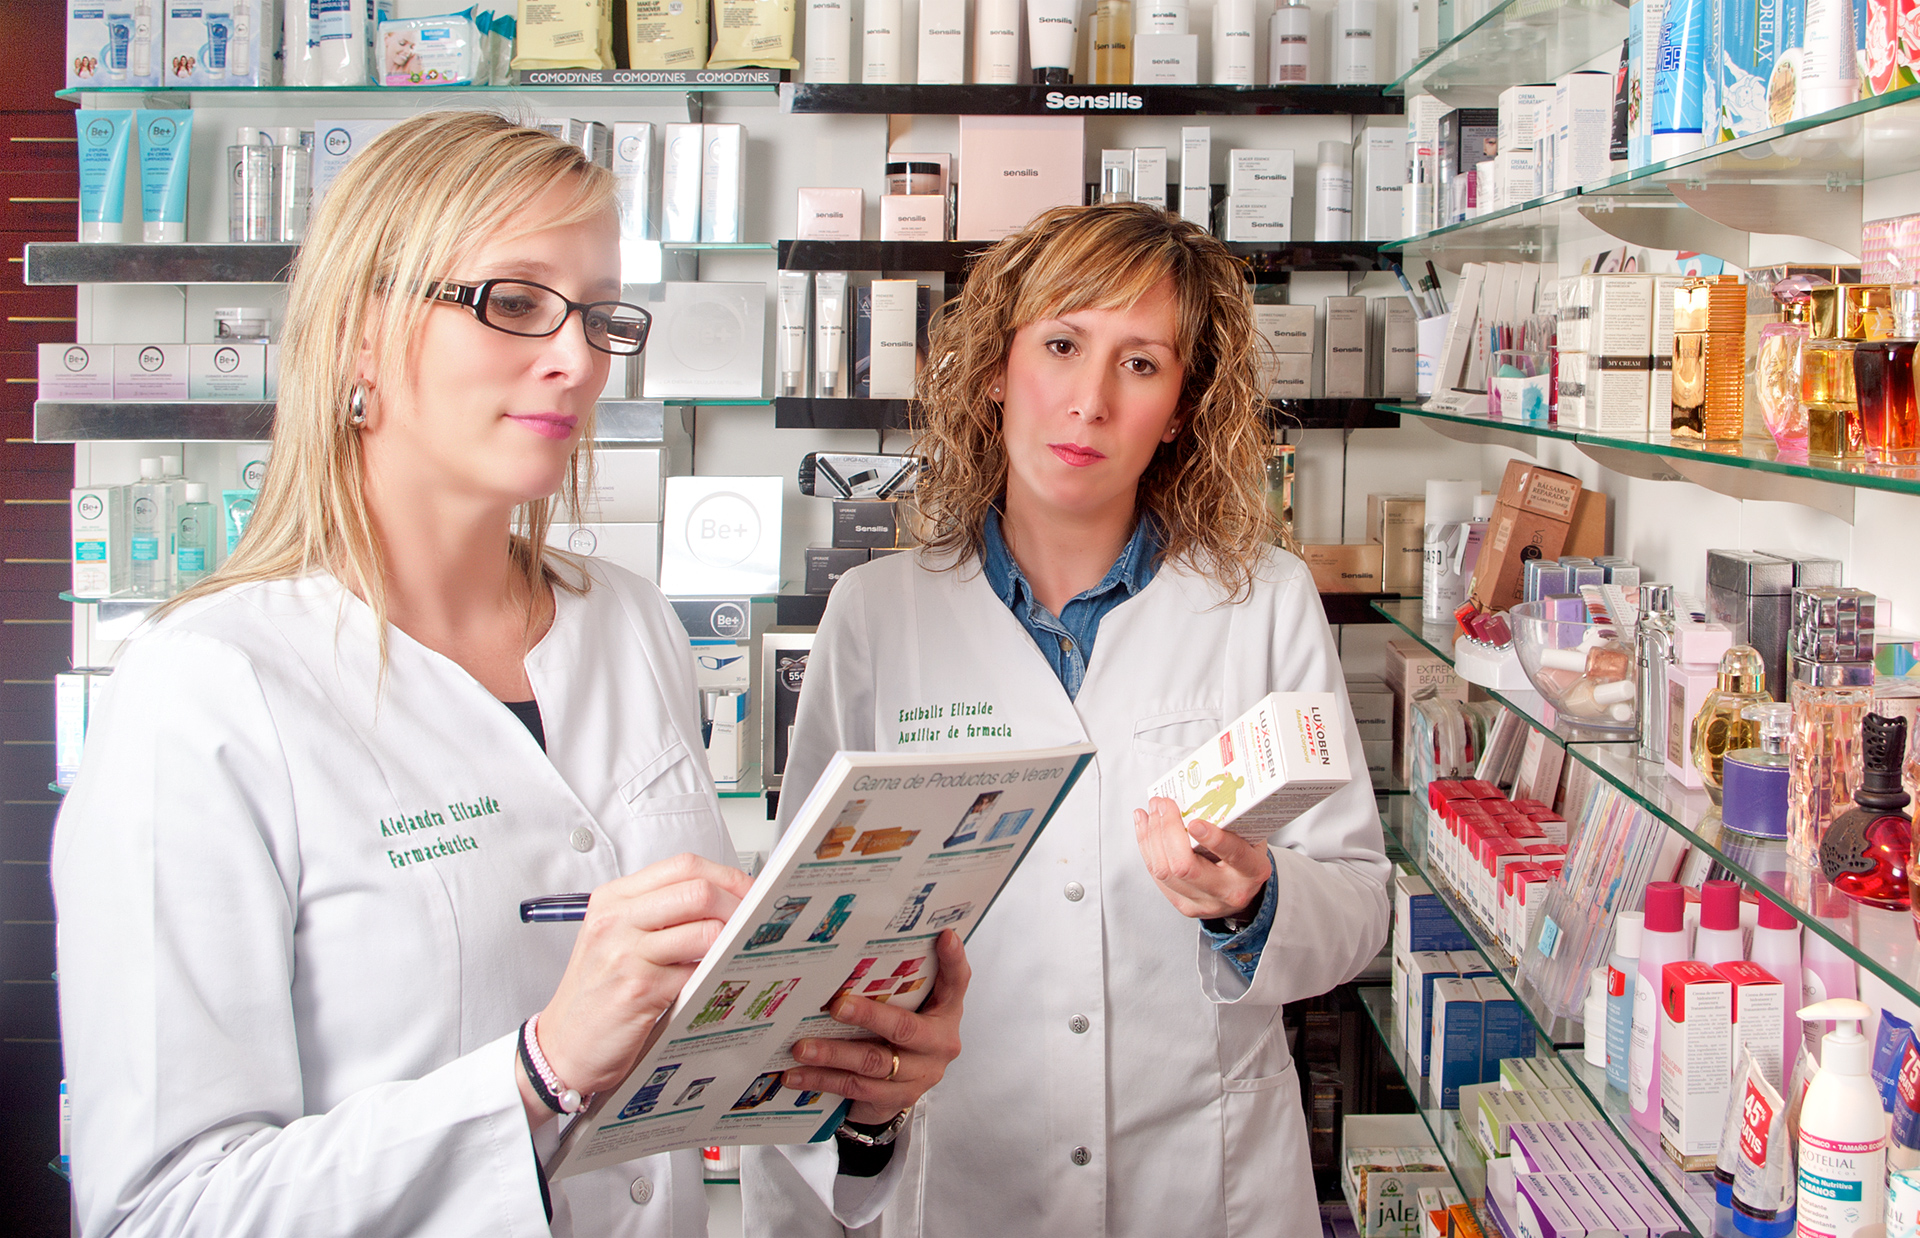 Equipo Farmacia Sandra Elizalde Miranda de Arga Navarra